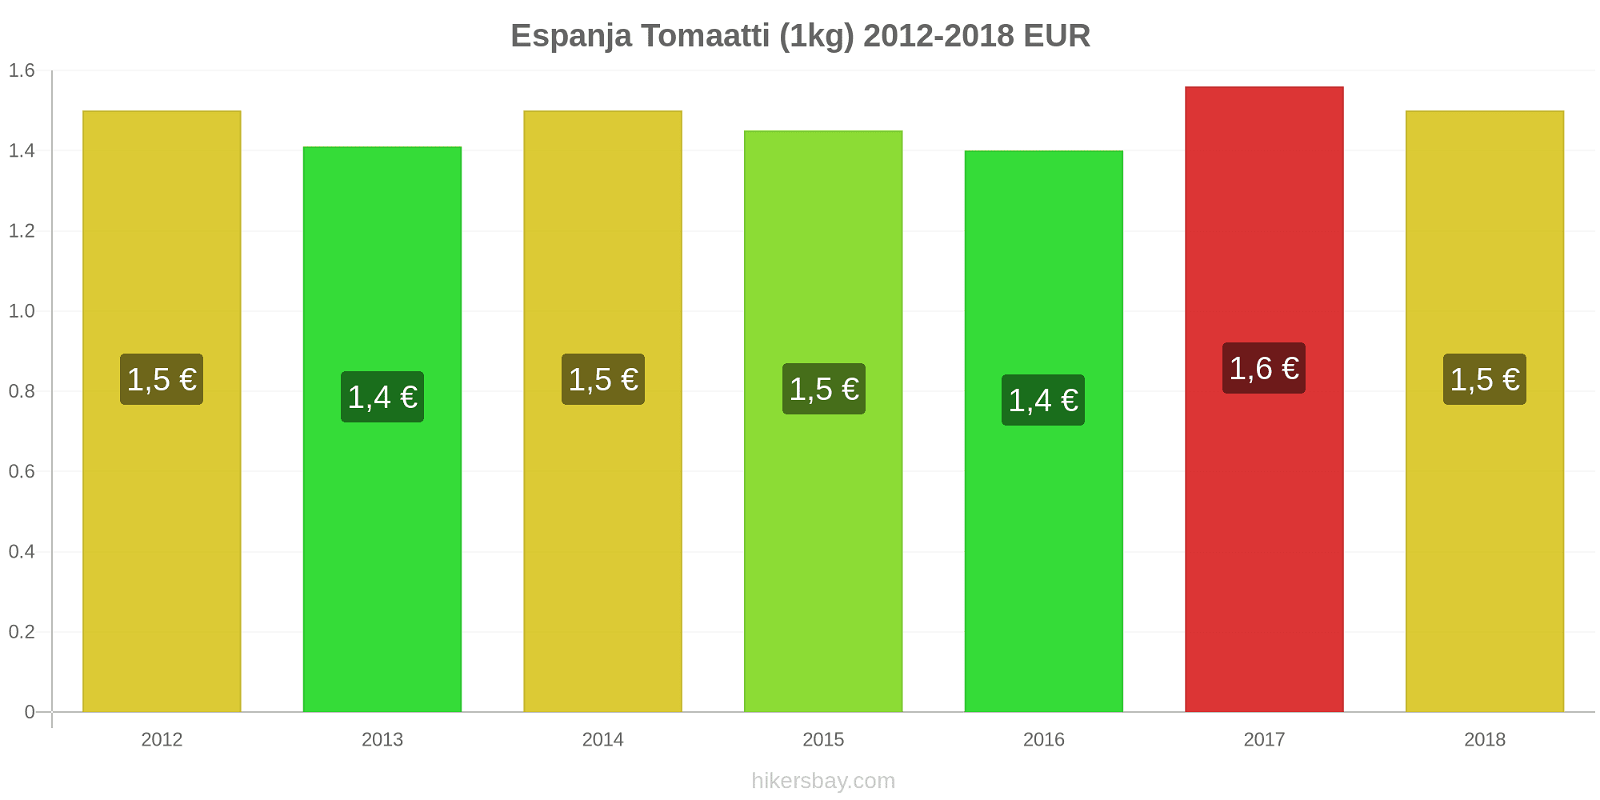 Espanja hintojen muutokset Tomaatti (1kg) hikersbay.com